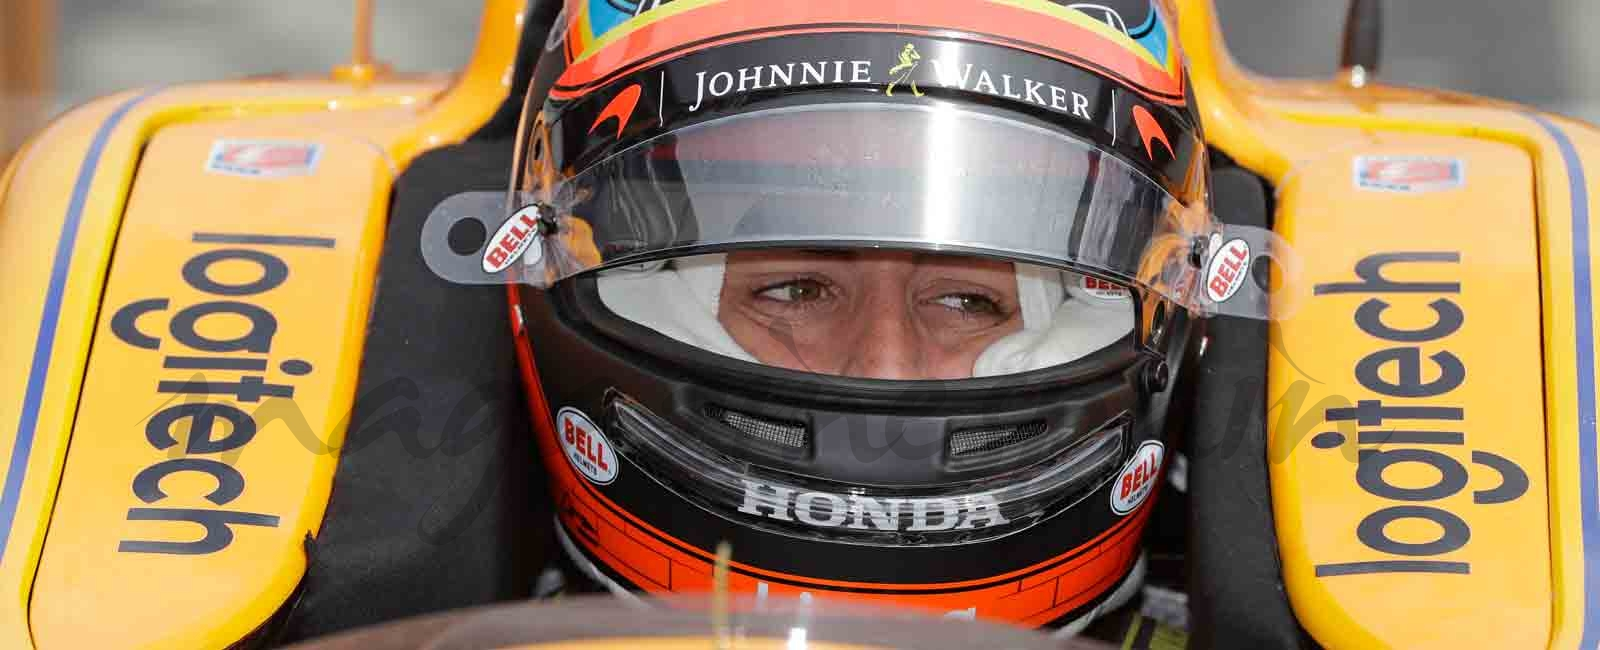 Fernando Alonso revoluciona las 500 millas de Indianápolis